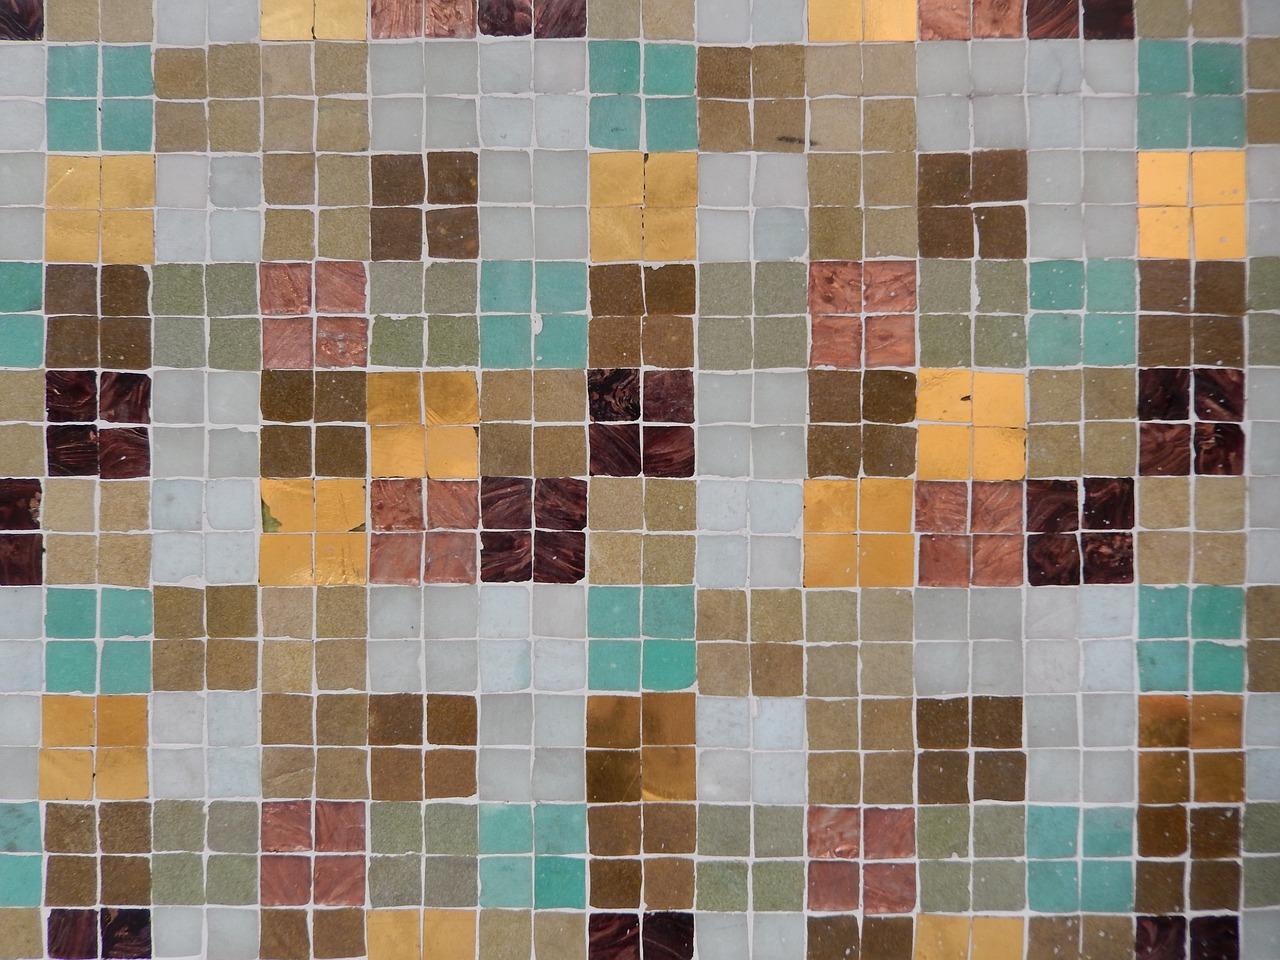 Цвет Limpet shell в интерьере , мозаика